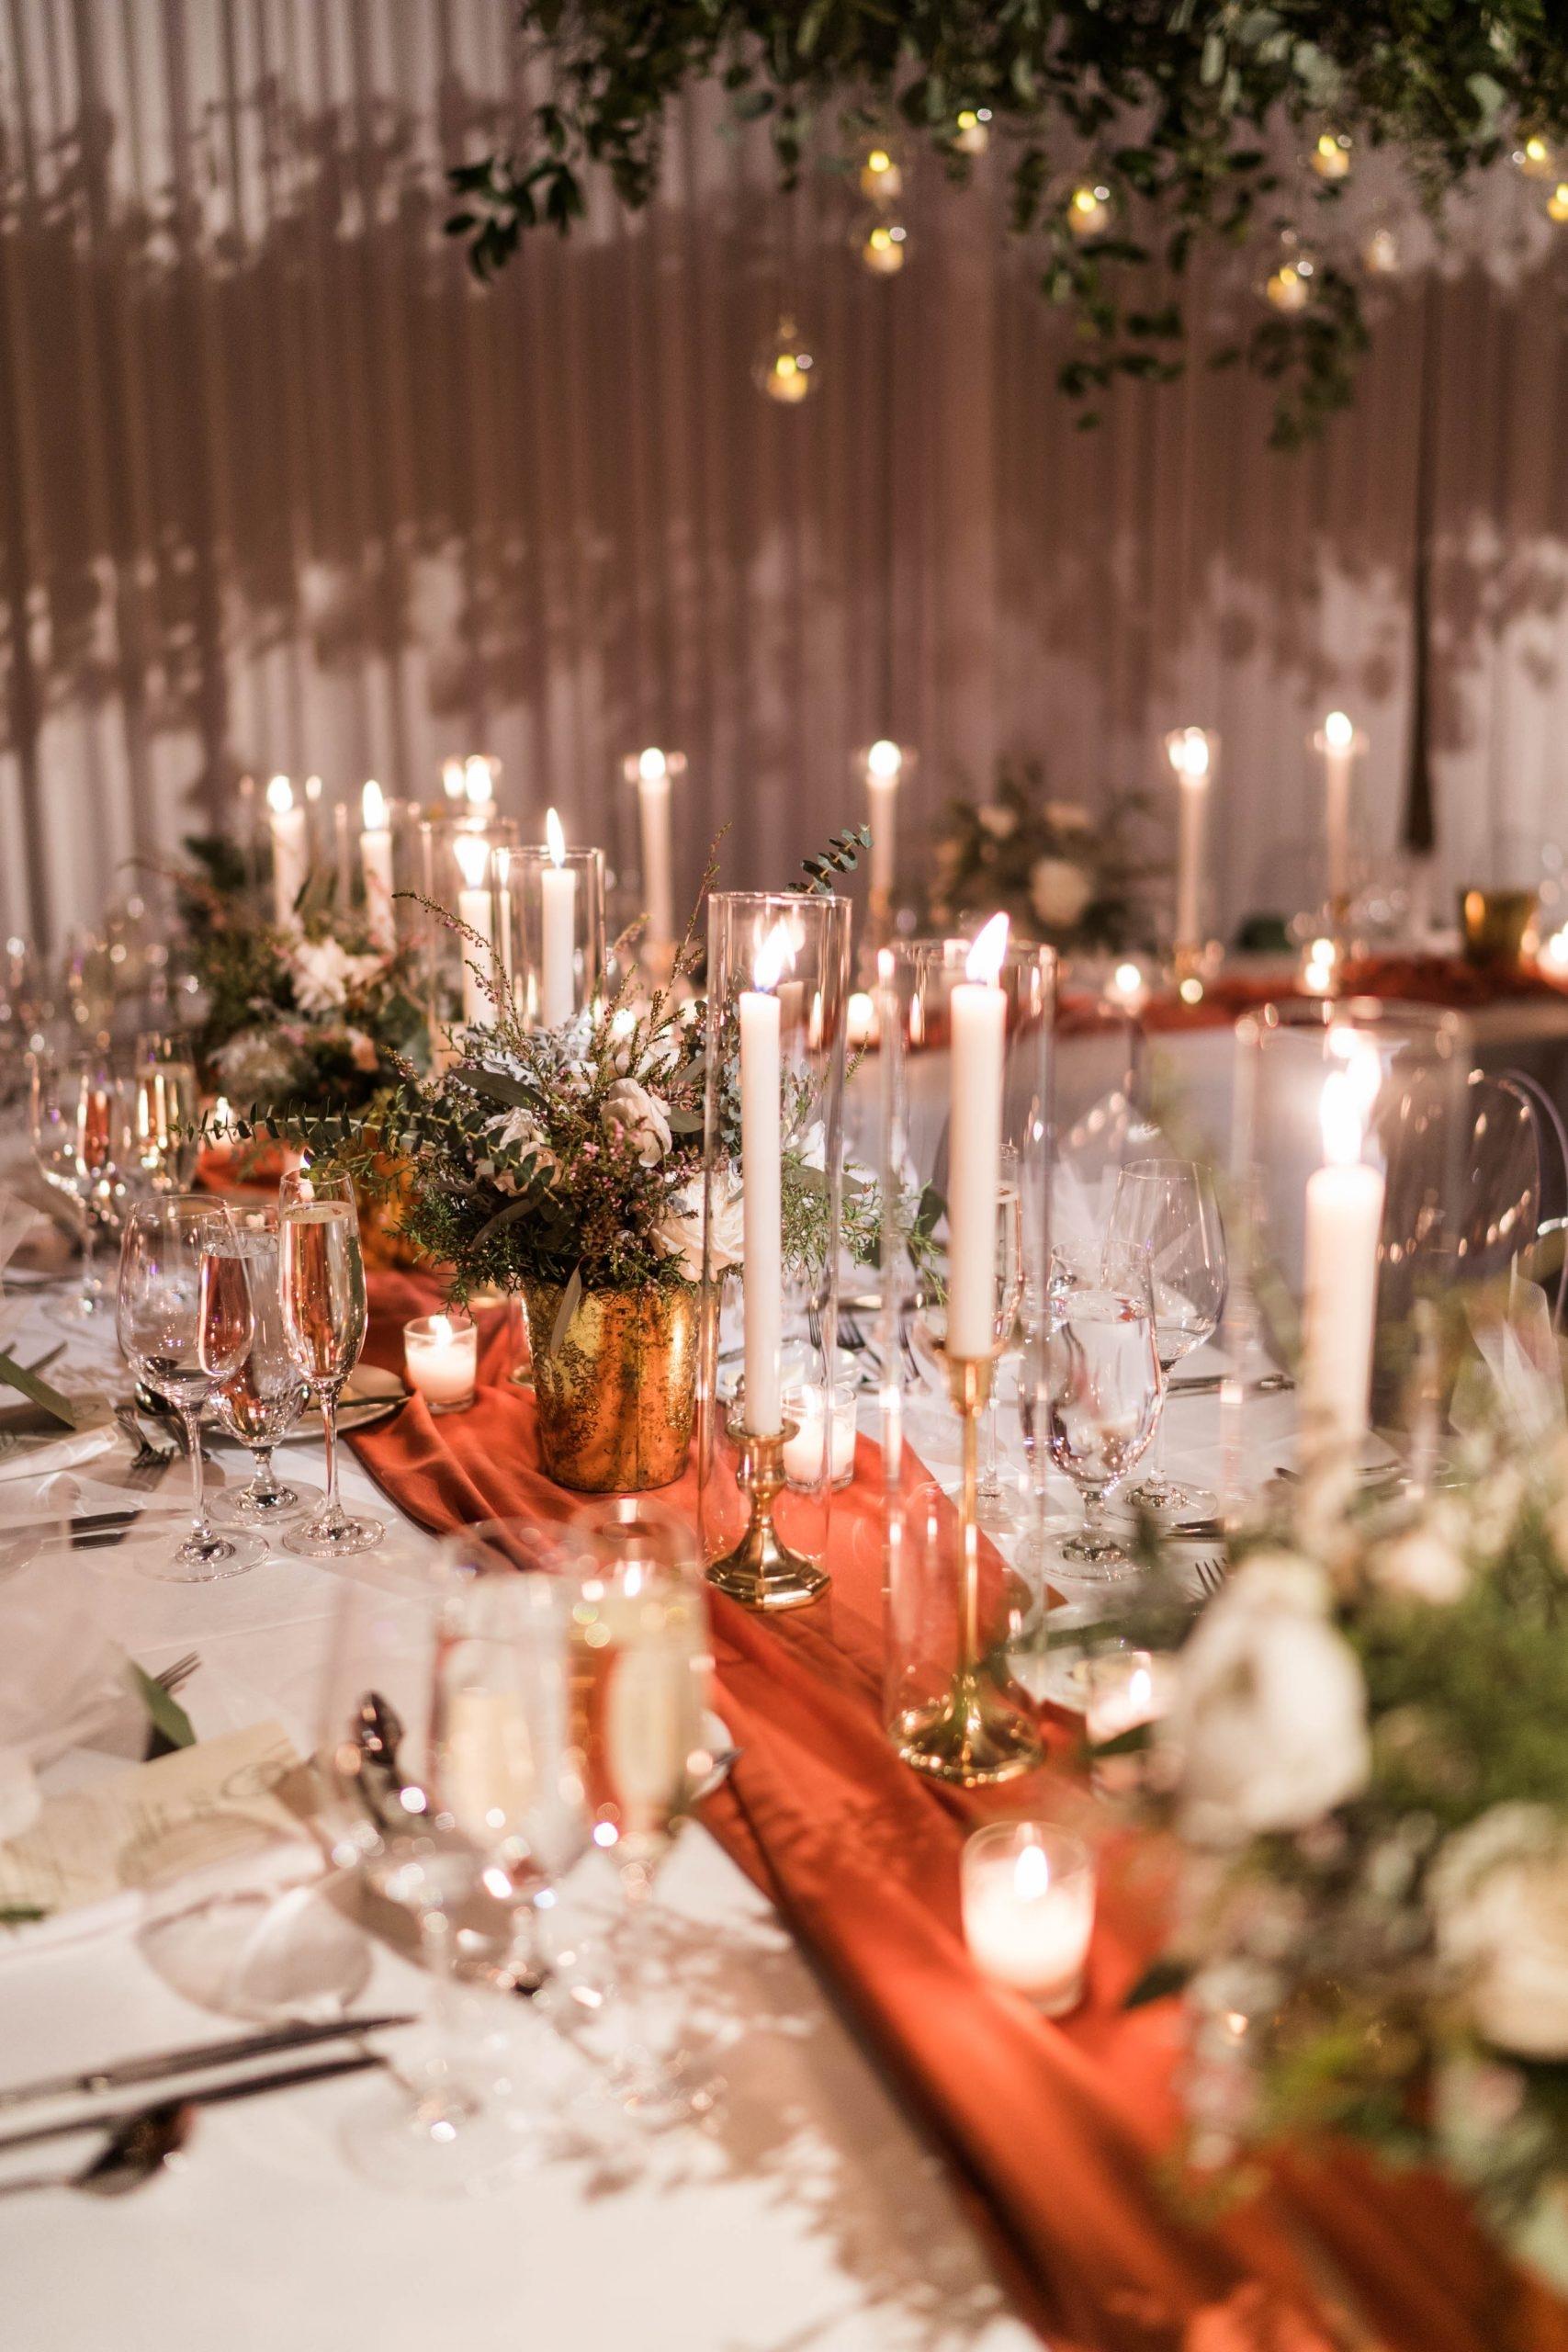 Romantic Winter Wedding Table Runner